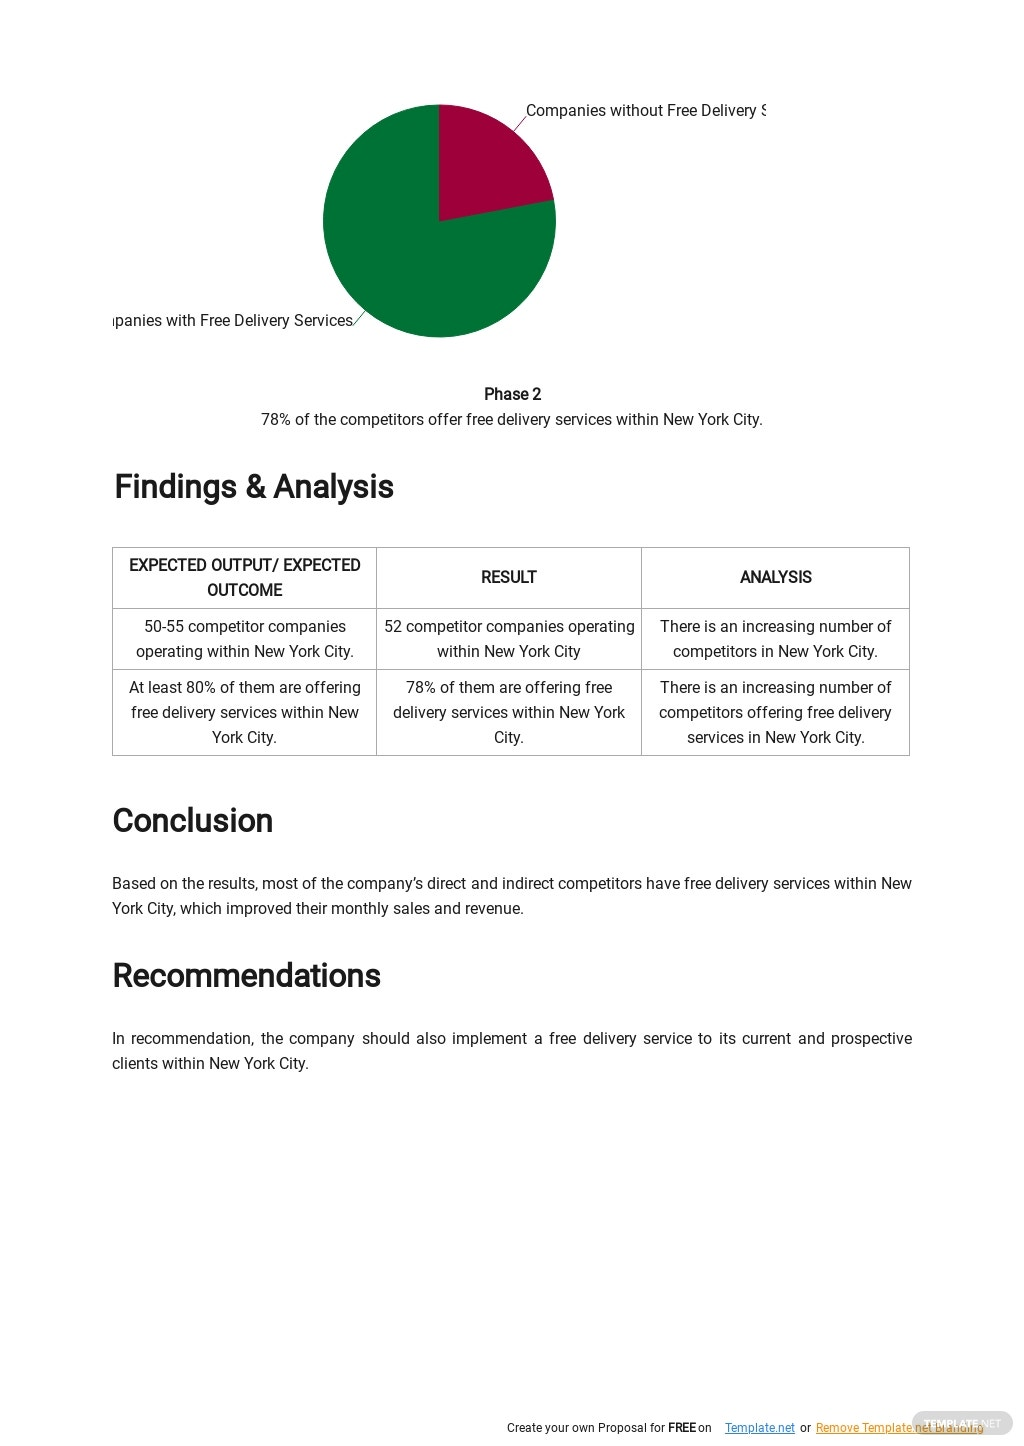 Qualitative Data Analysis Plan Template 4.jpe